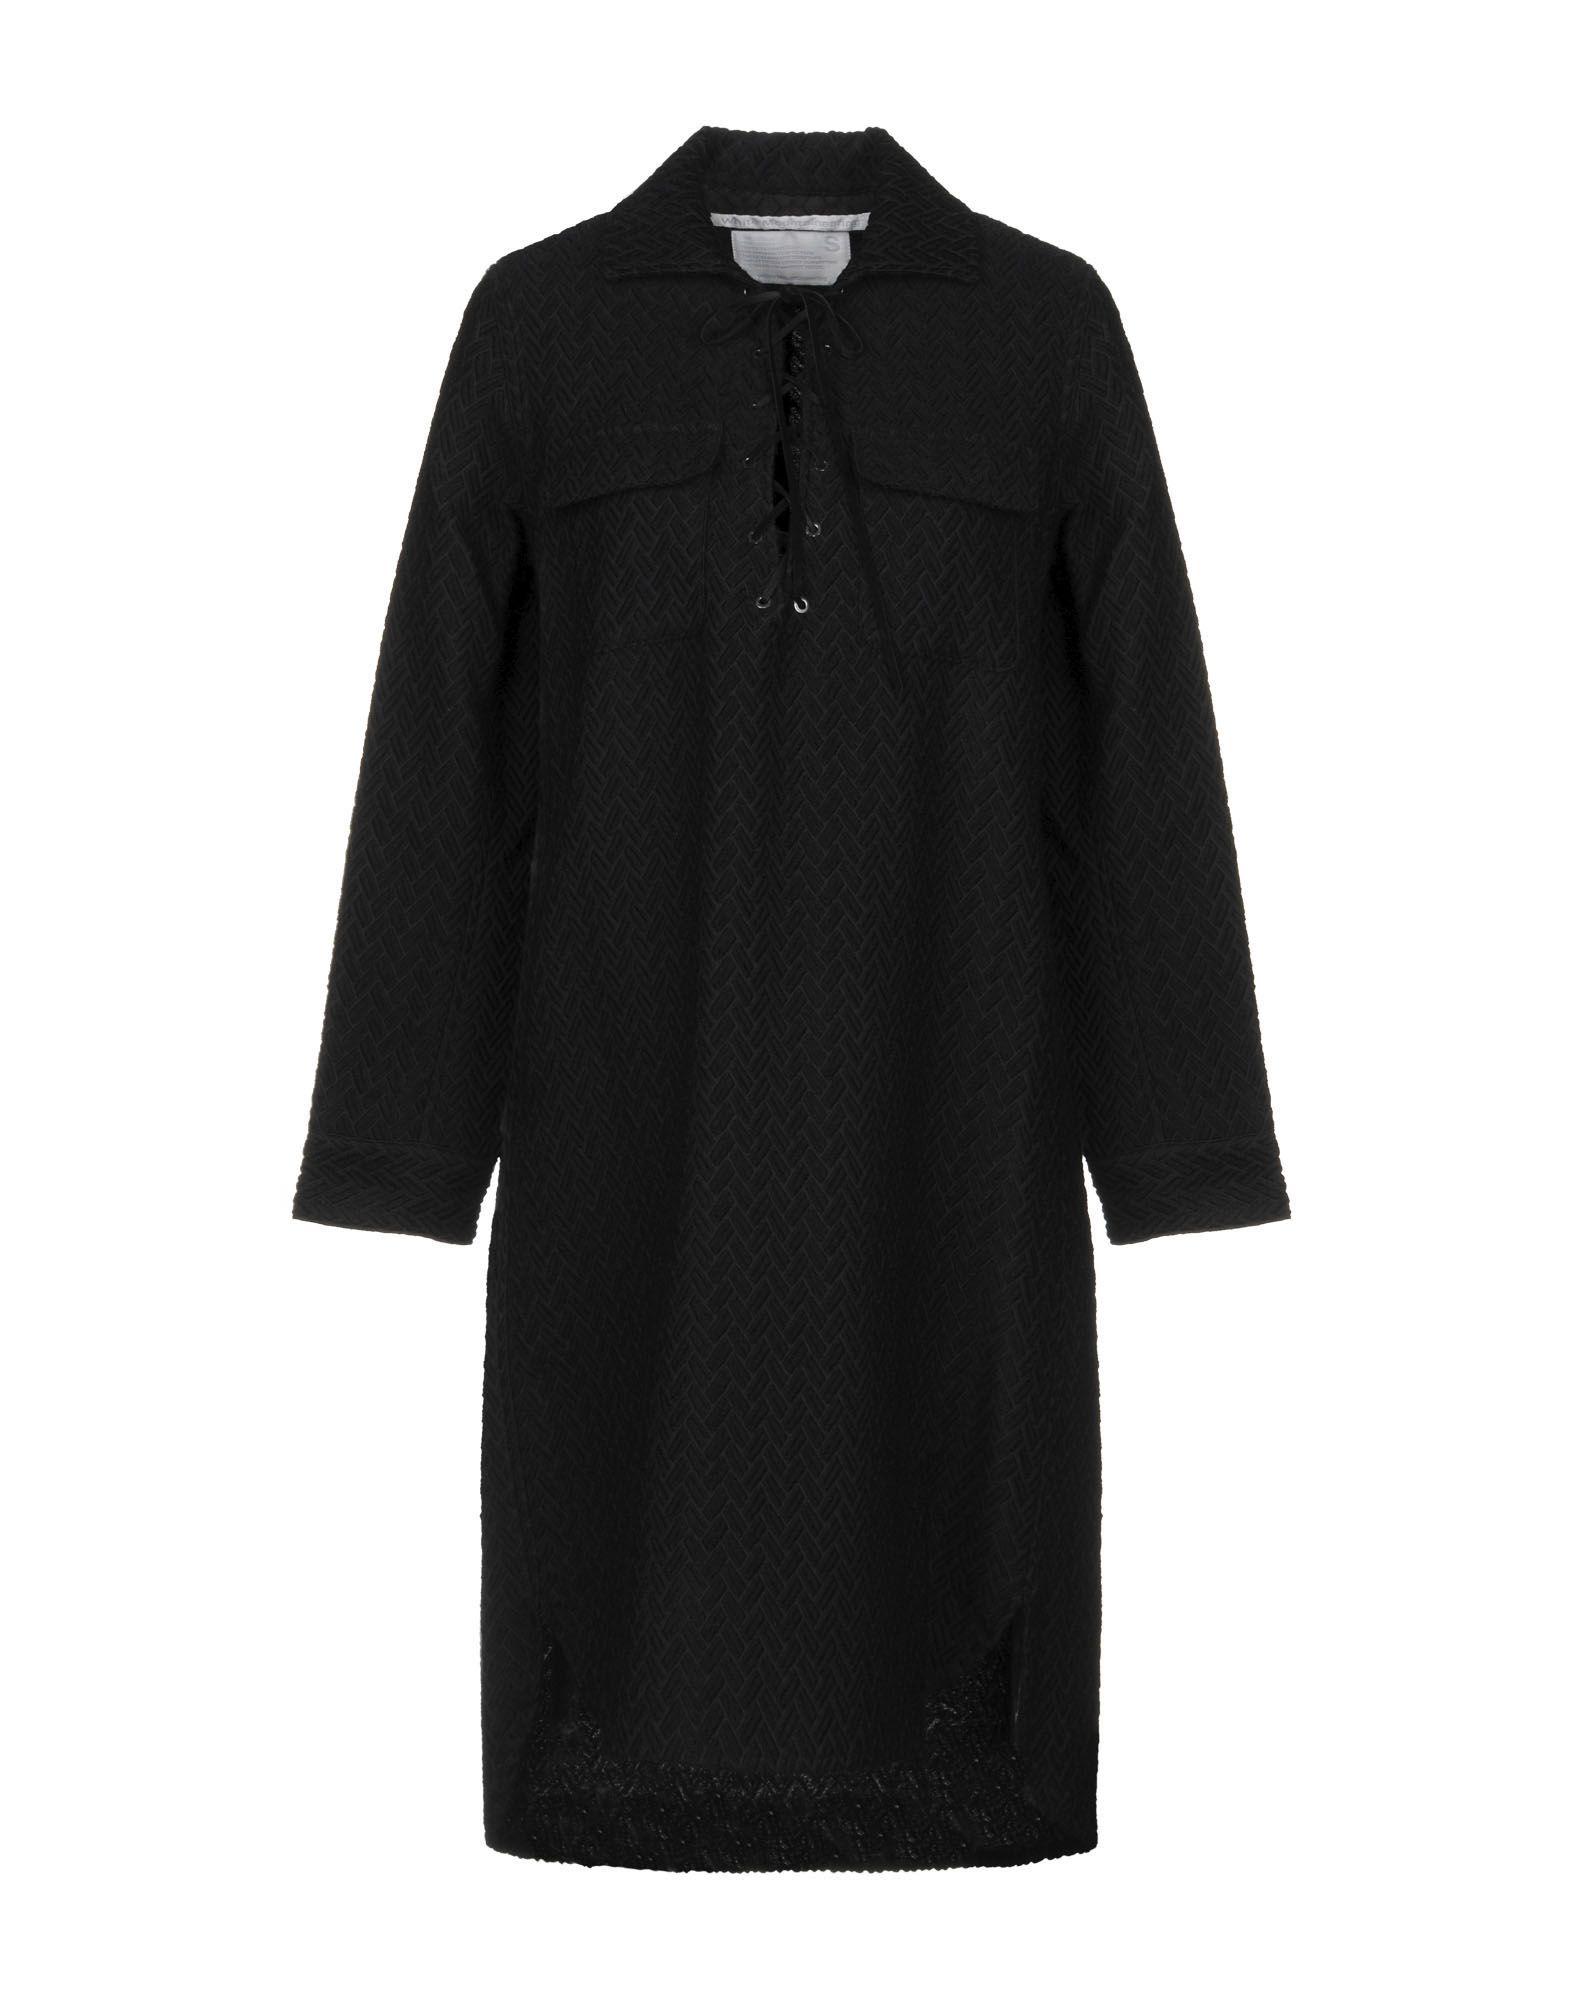 купить WHITE MOUNTAINEERING Короткое платье по цене 6300 рублей